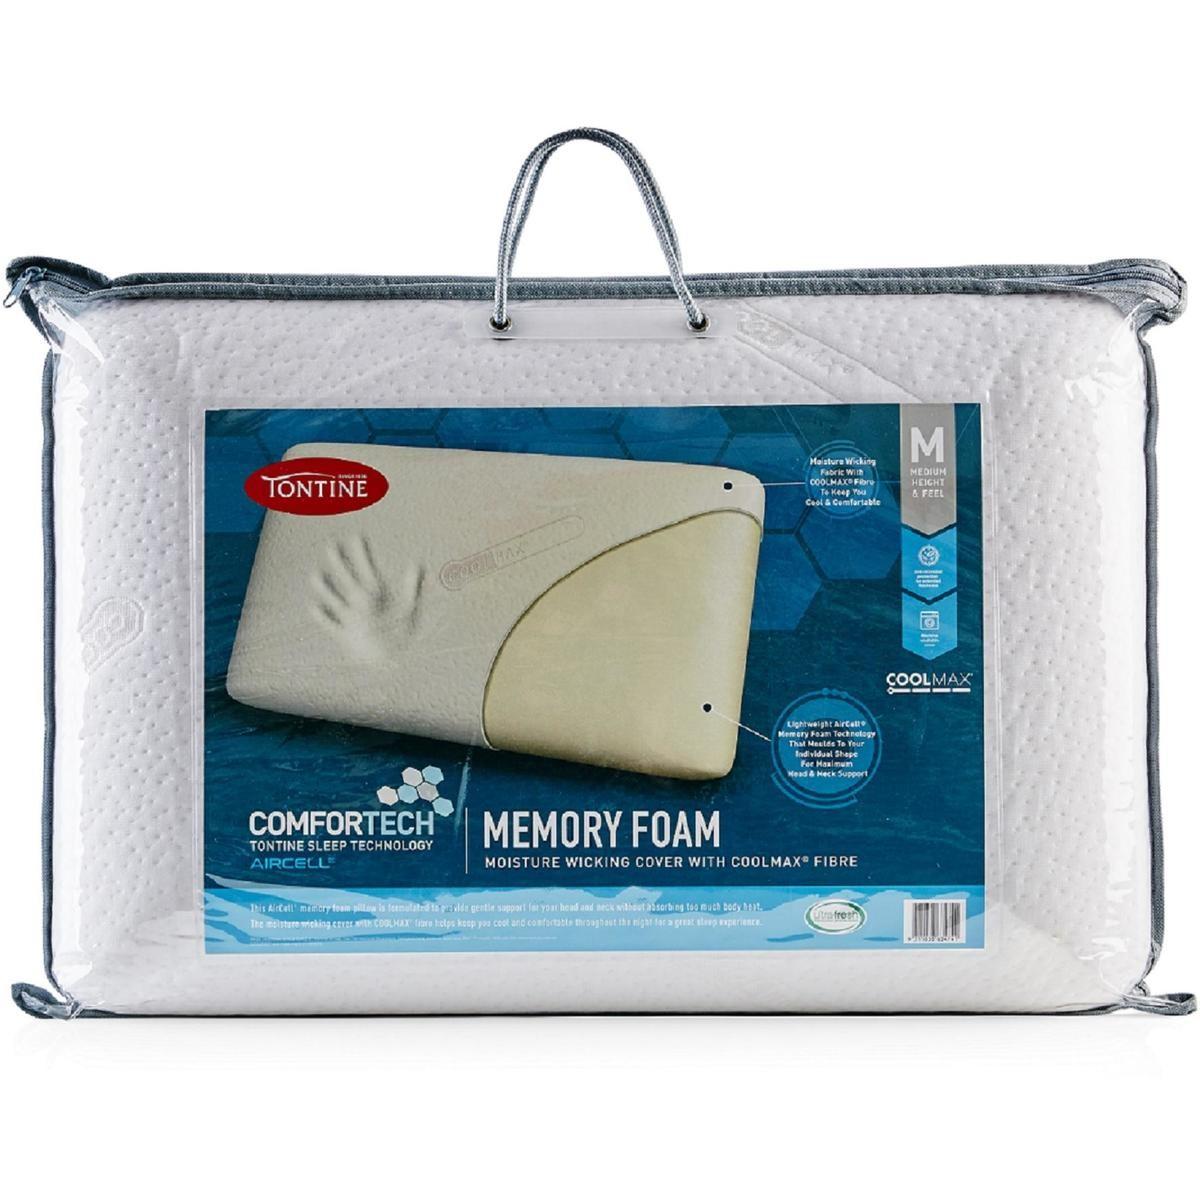 tontine comfortech memory foam pillow